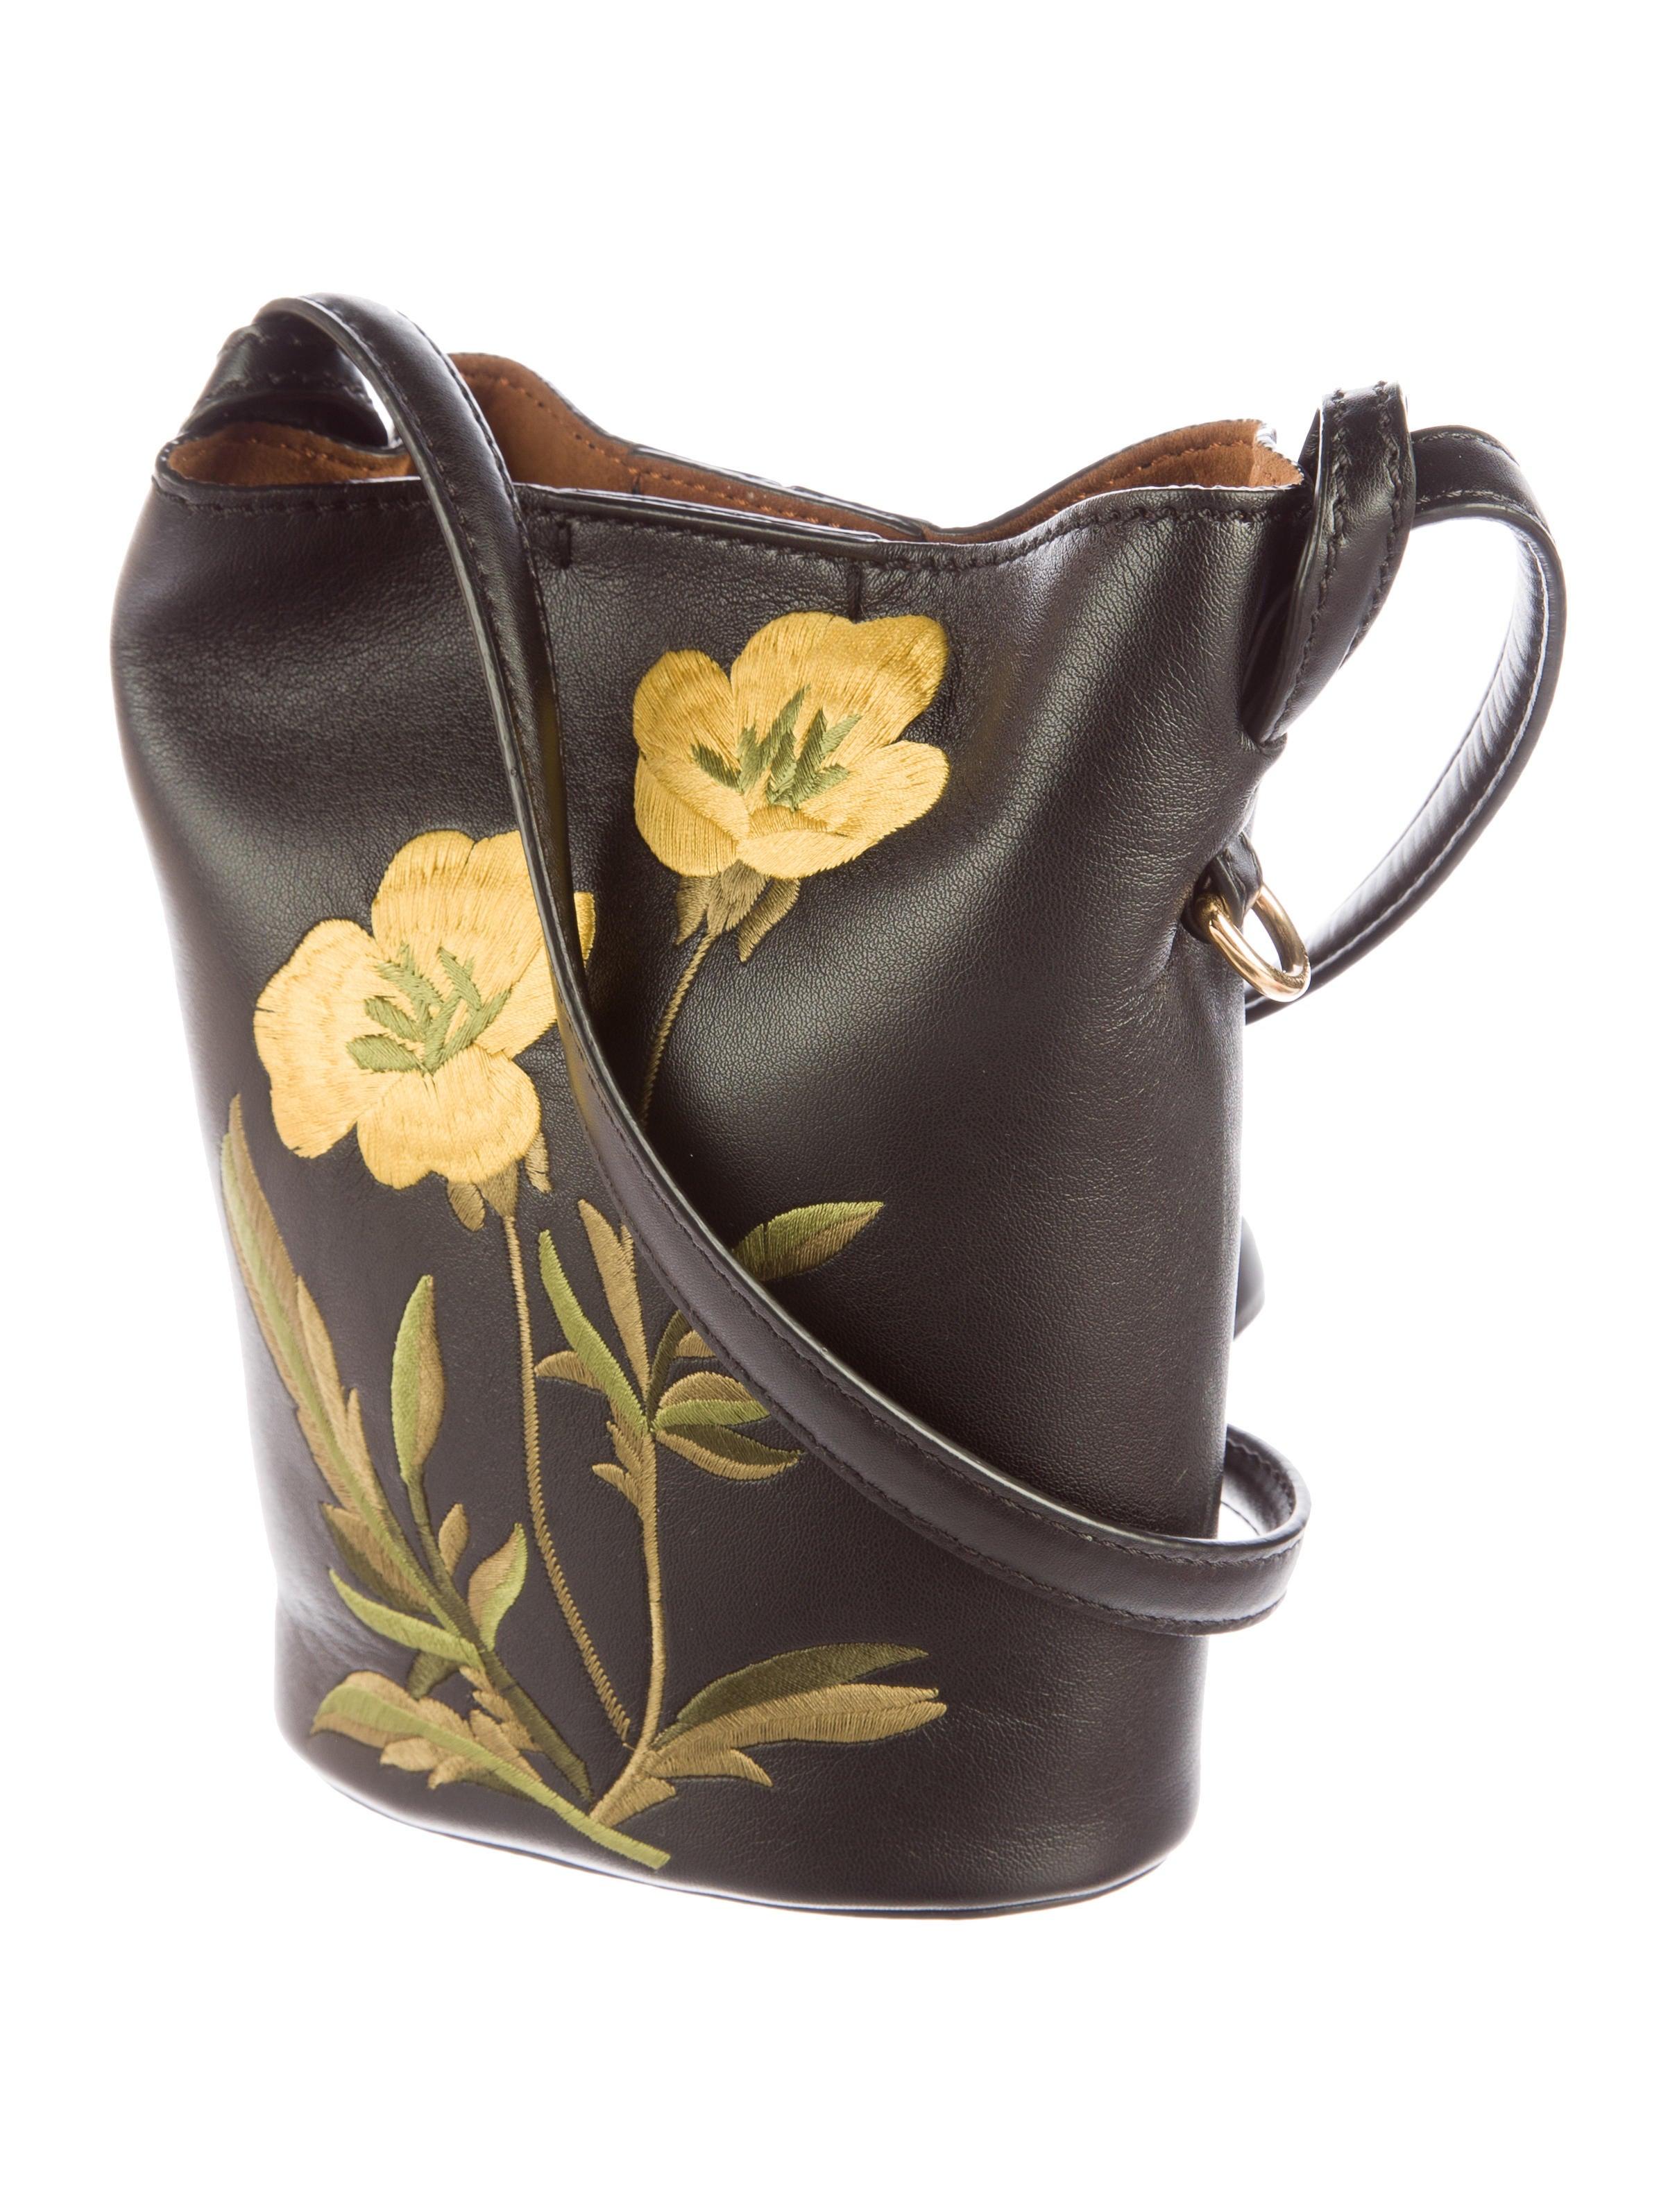 Stella Mccartney 2016 Embroidered Crossbody Bag Handbags